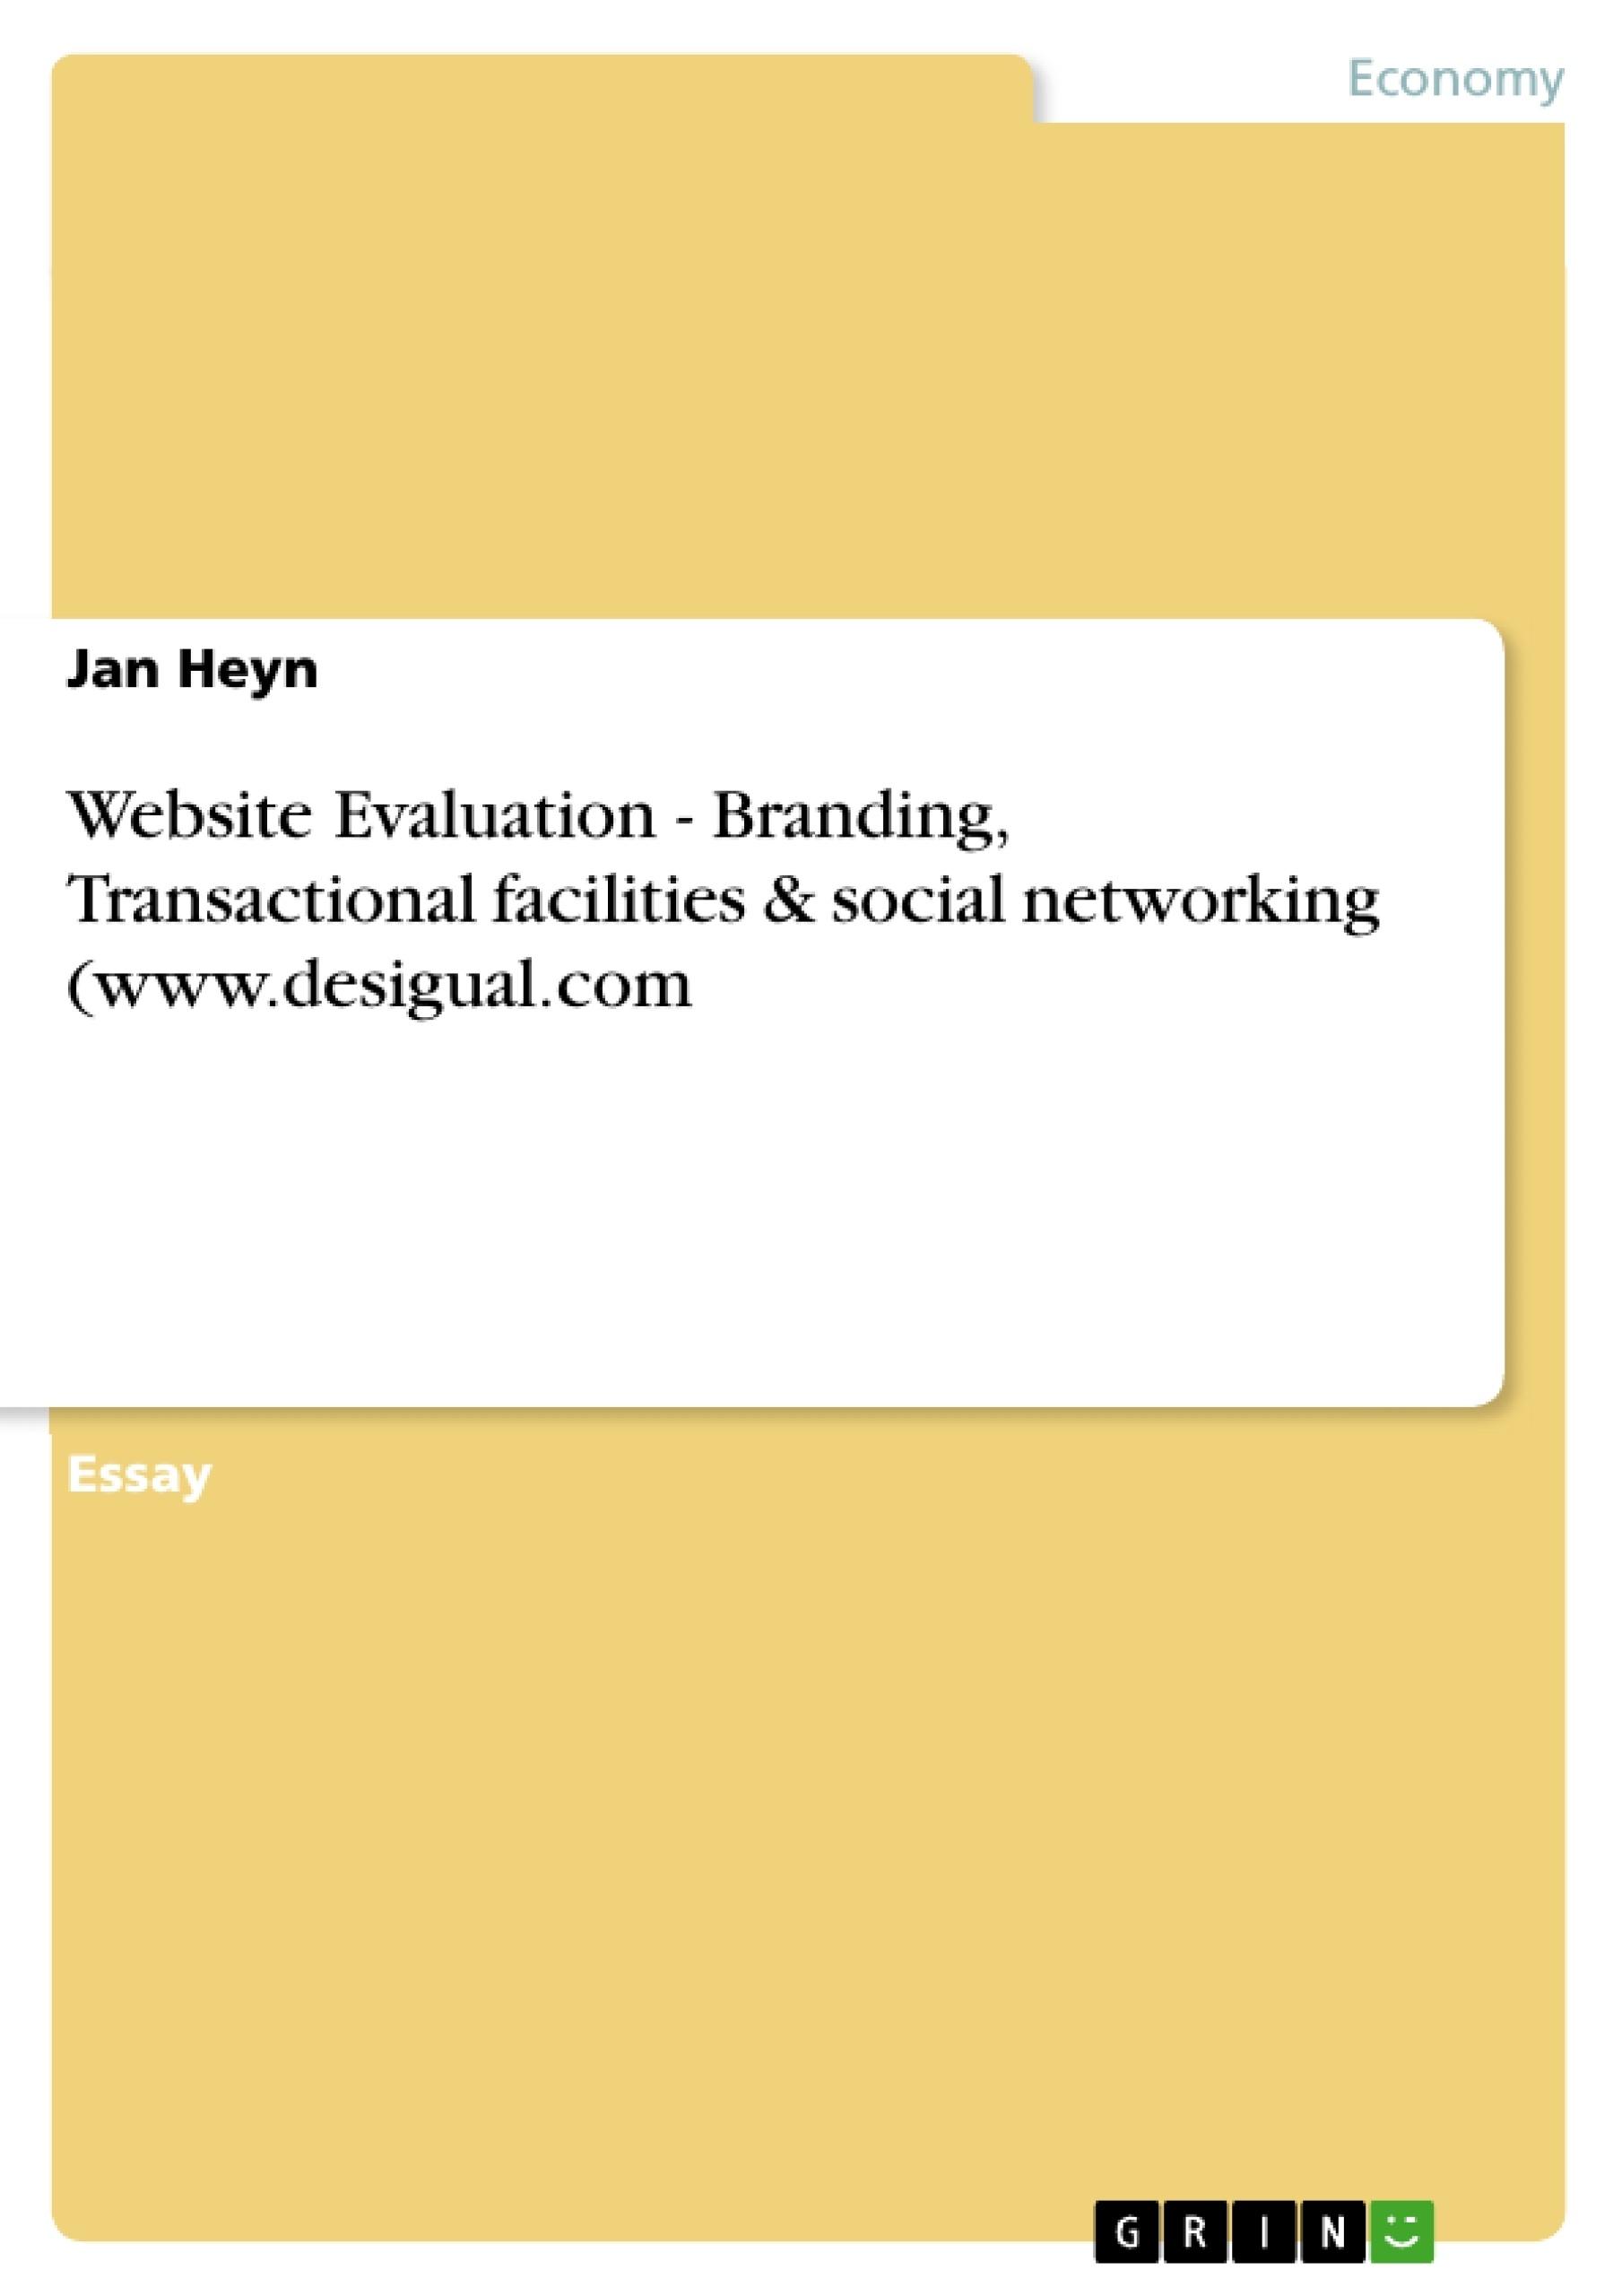 Title: Website Evaluation - Branding, Transactional facilities & social networking (www.desigual.com